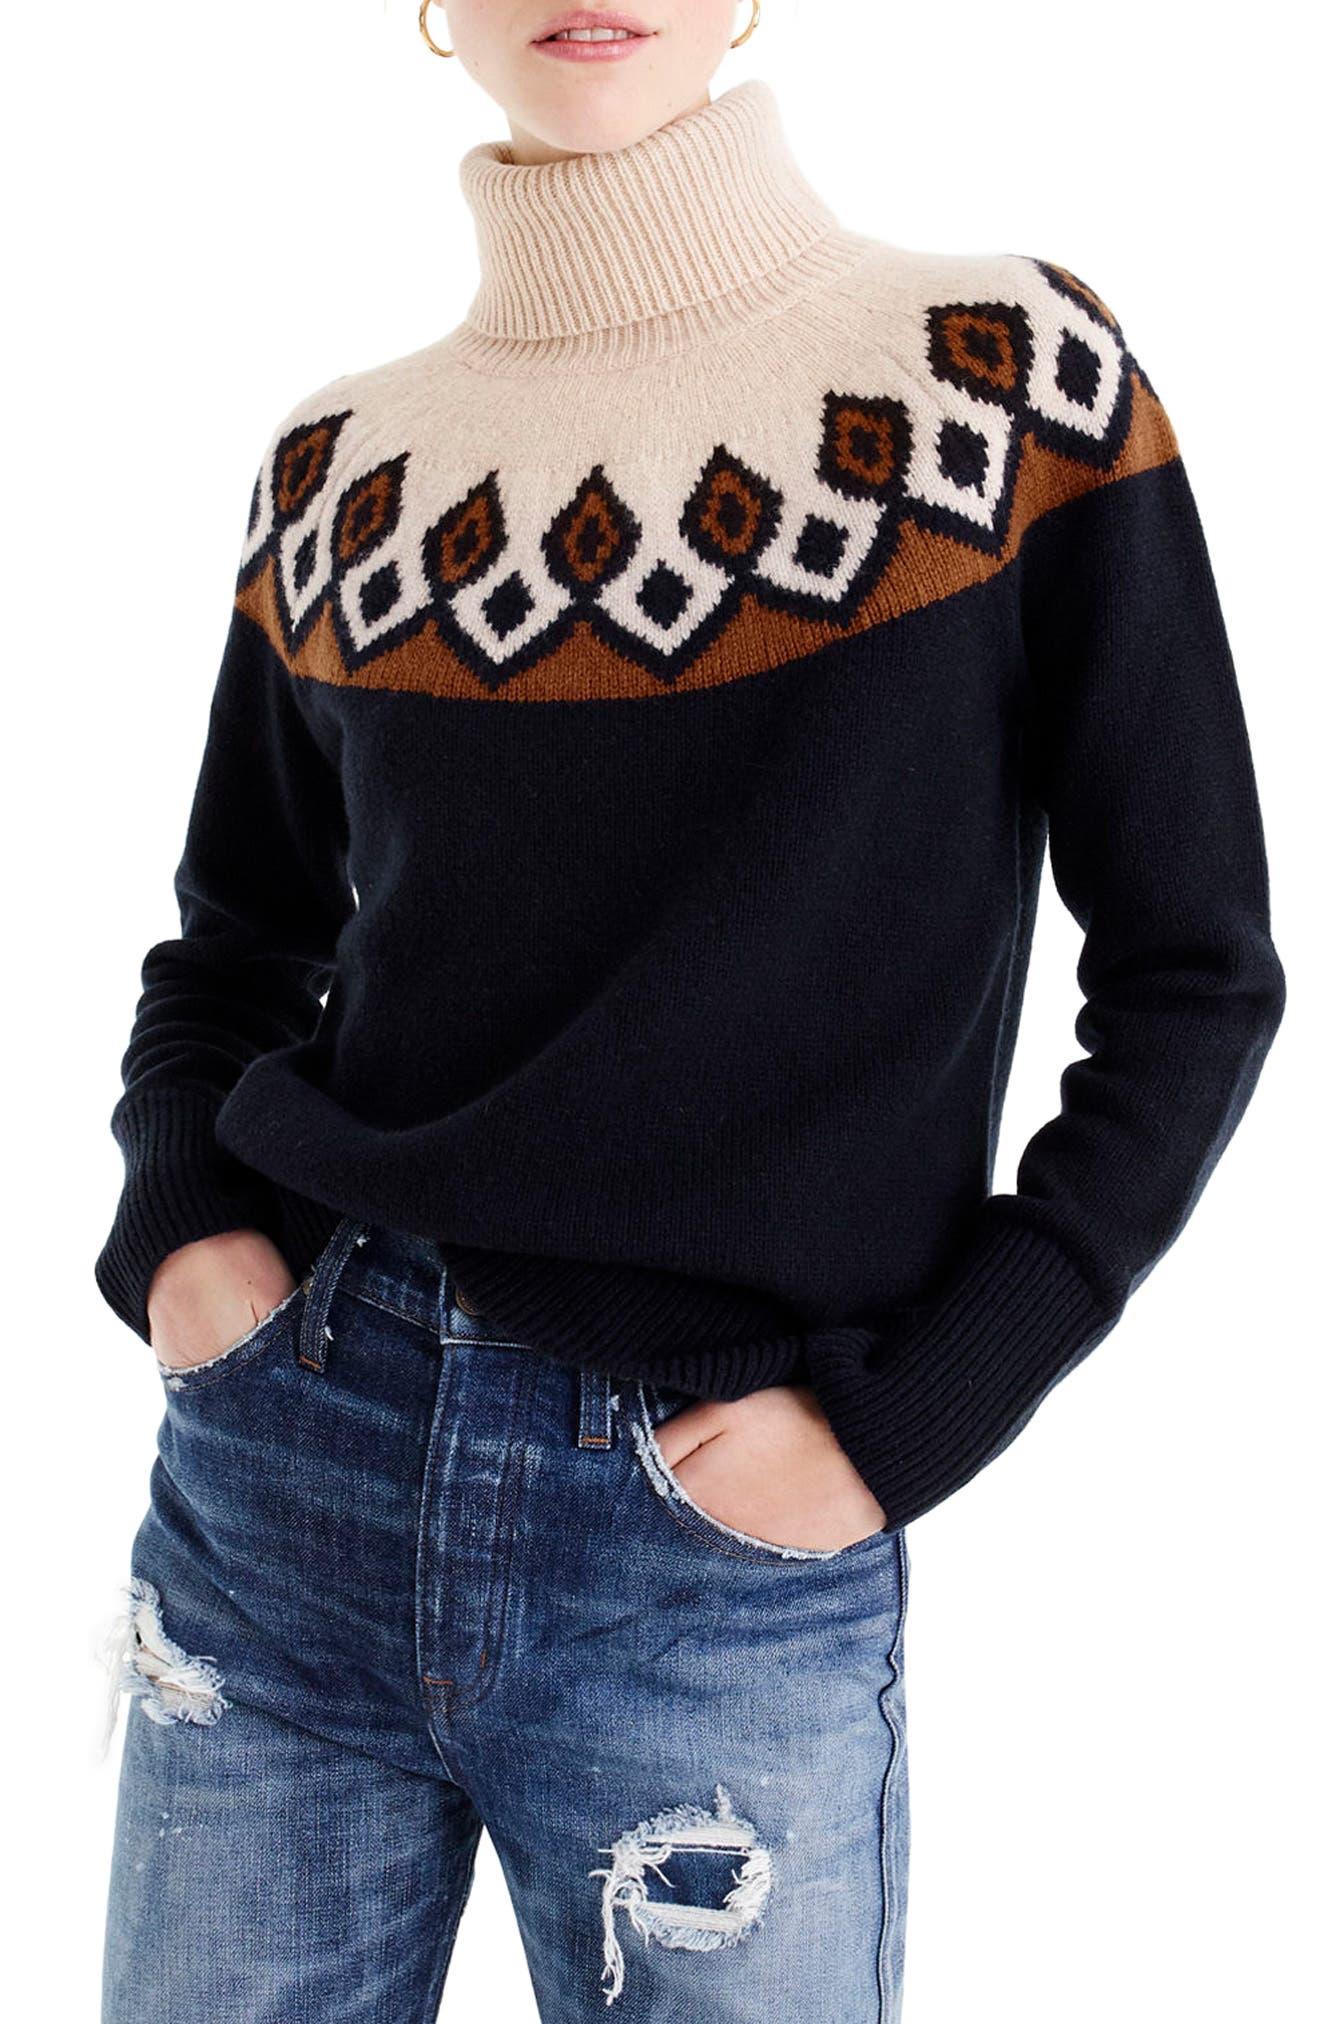 Alternate Image 1 Selected - J.Crew Ambrose Fair Isle Merino Wool Sweater